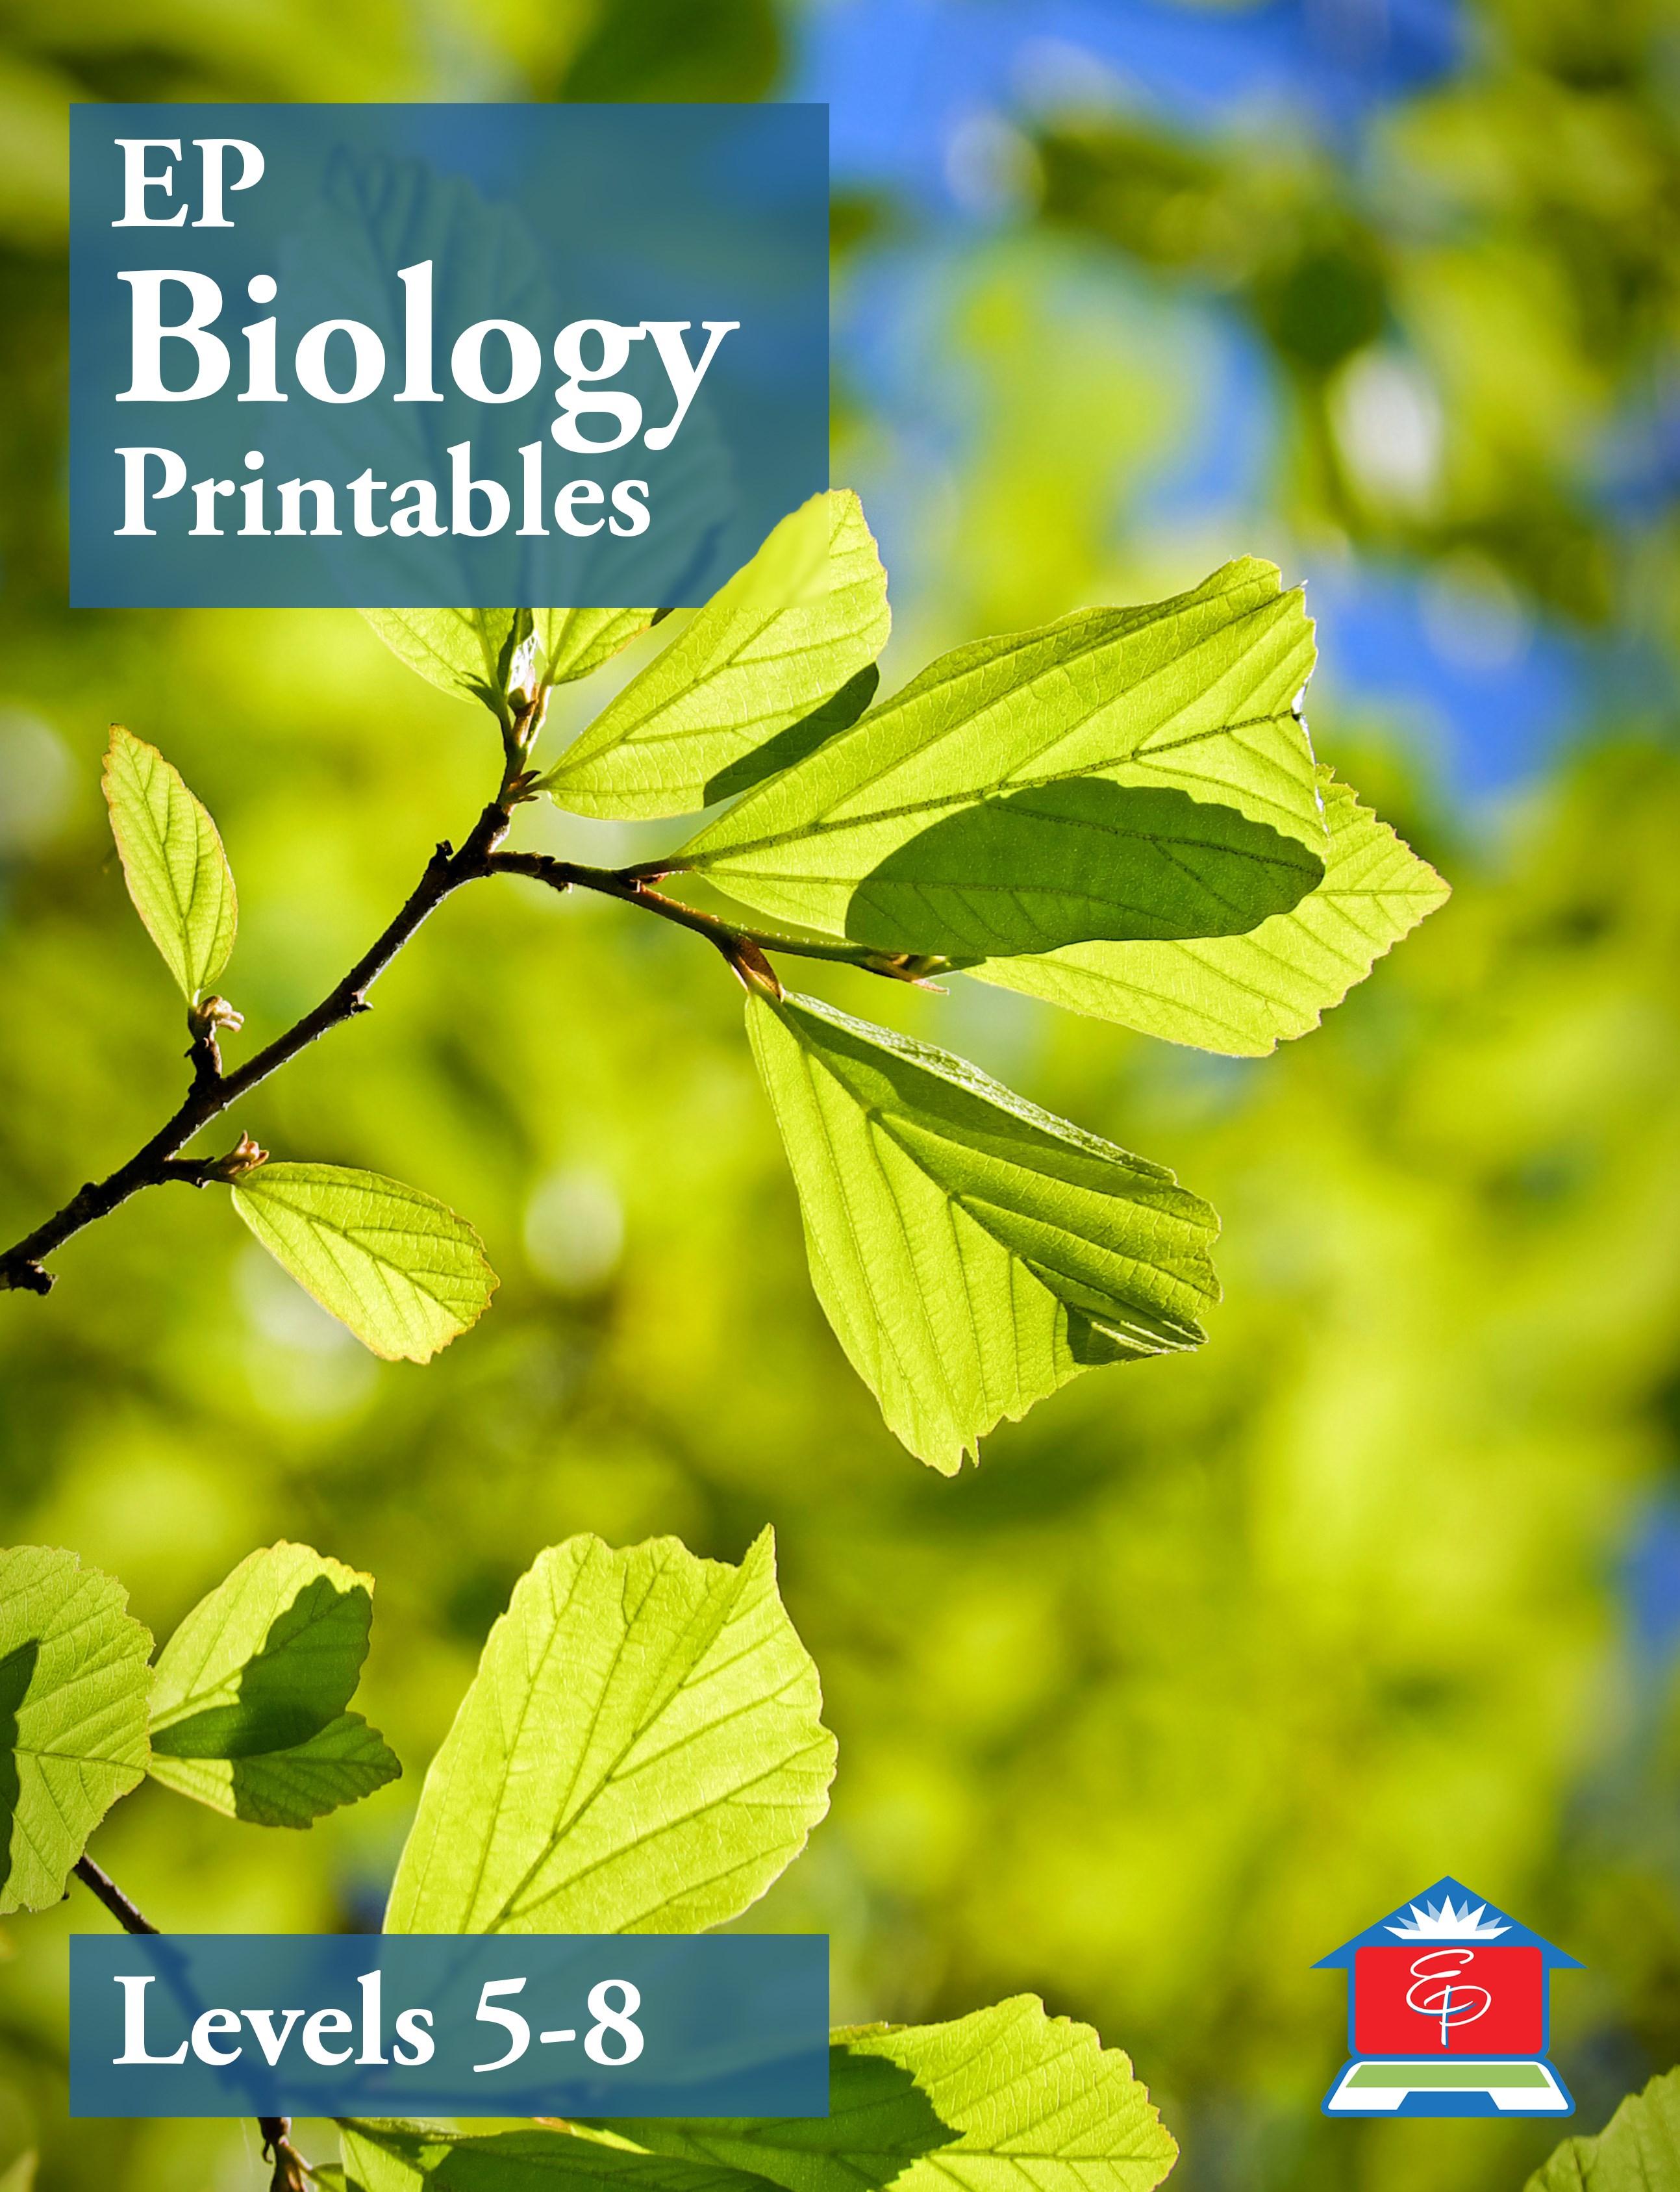 medium resolution of Science — Biology – Easy Peasy All-in-One Homeschool